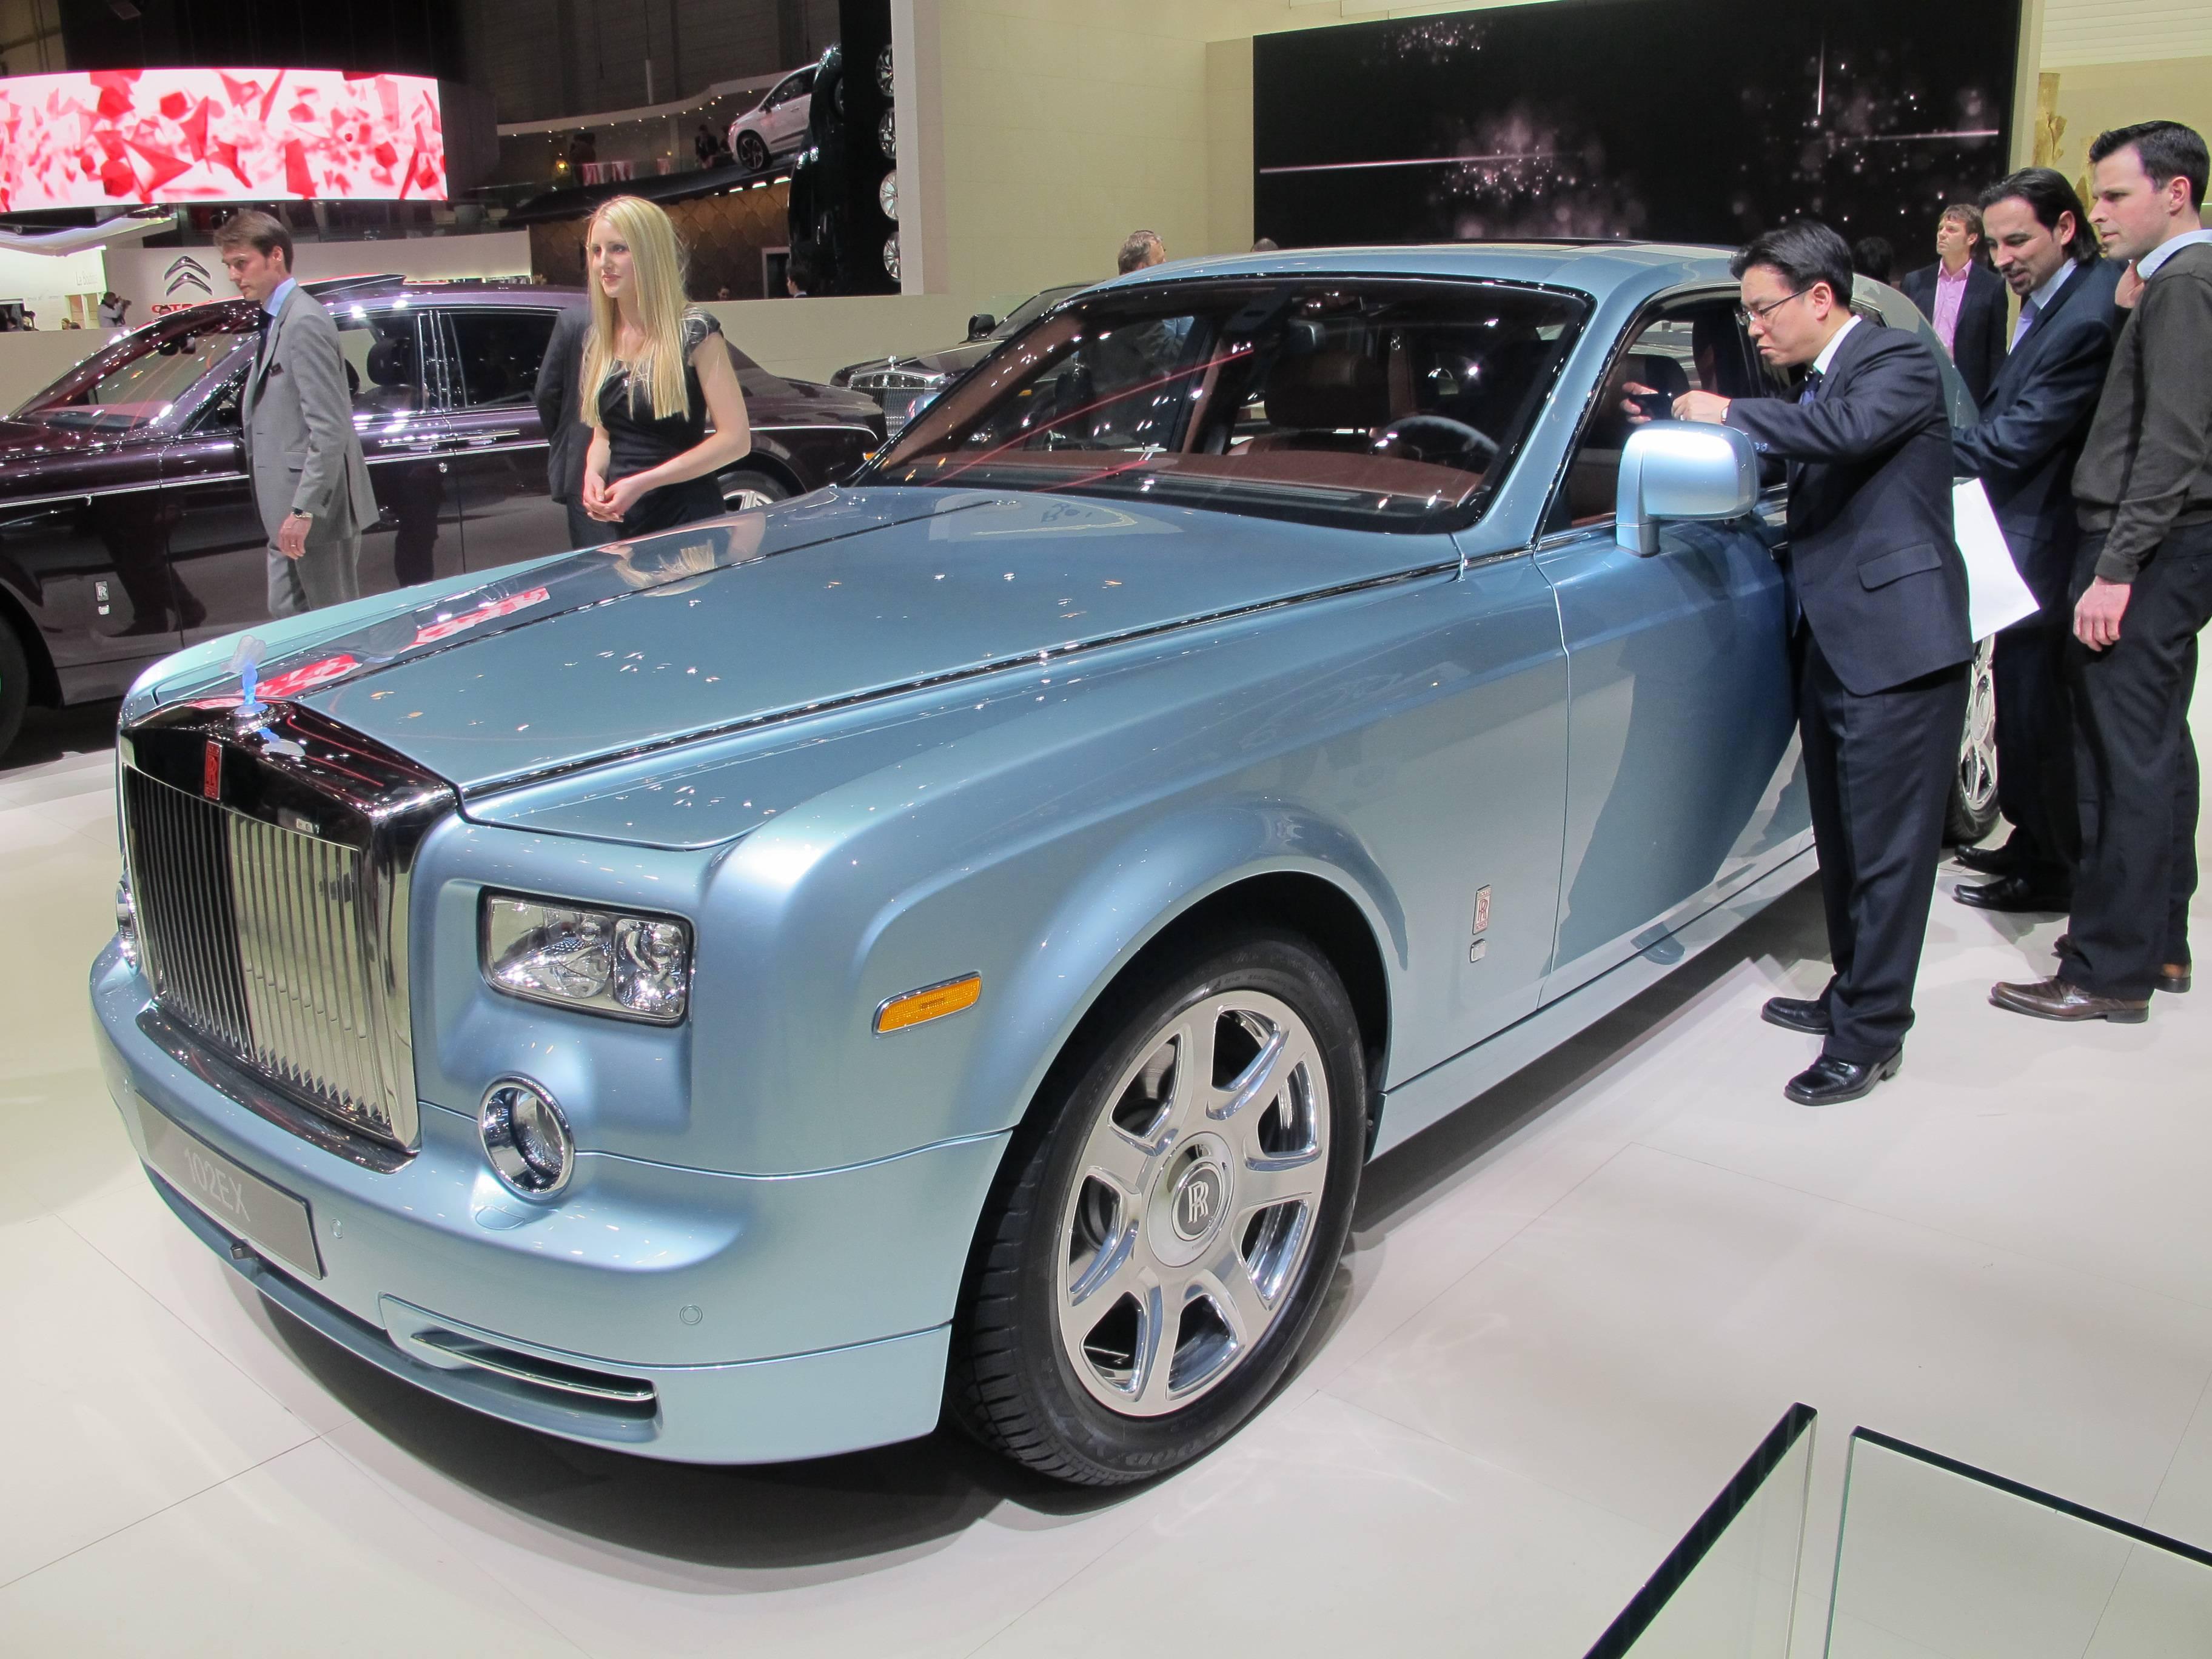 Geneva Motor Show- Rolls-Royce 102EX (Electric Vehicle)